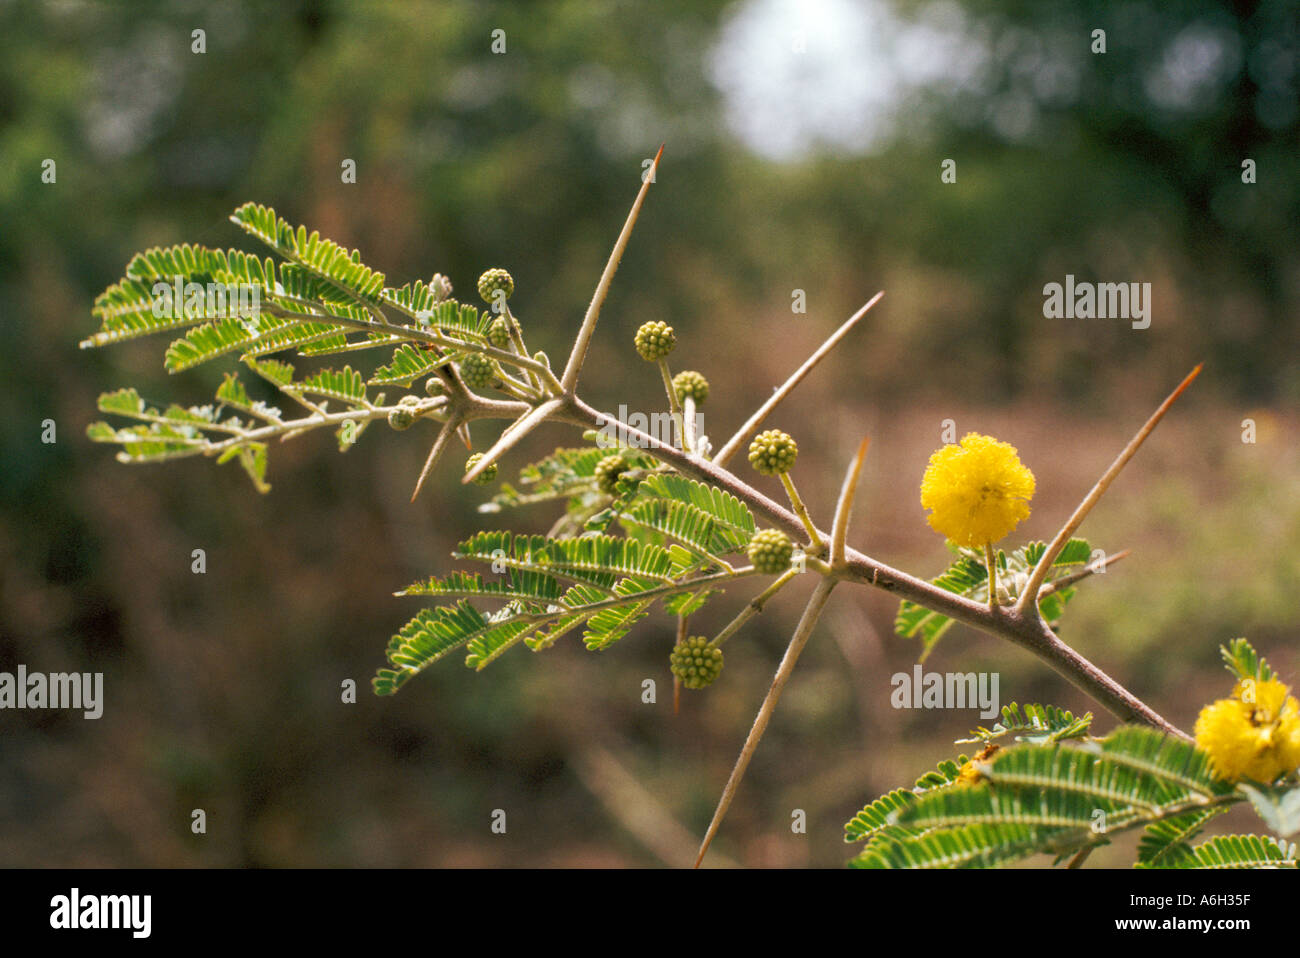 Acacia nilotica Mimosaceae Leguminosae a thorny small tree in sahel semi arid vegetation Islands of Lake Chad Chad Africa - Stock Image